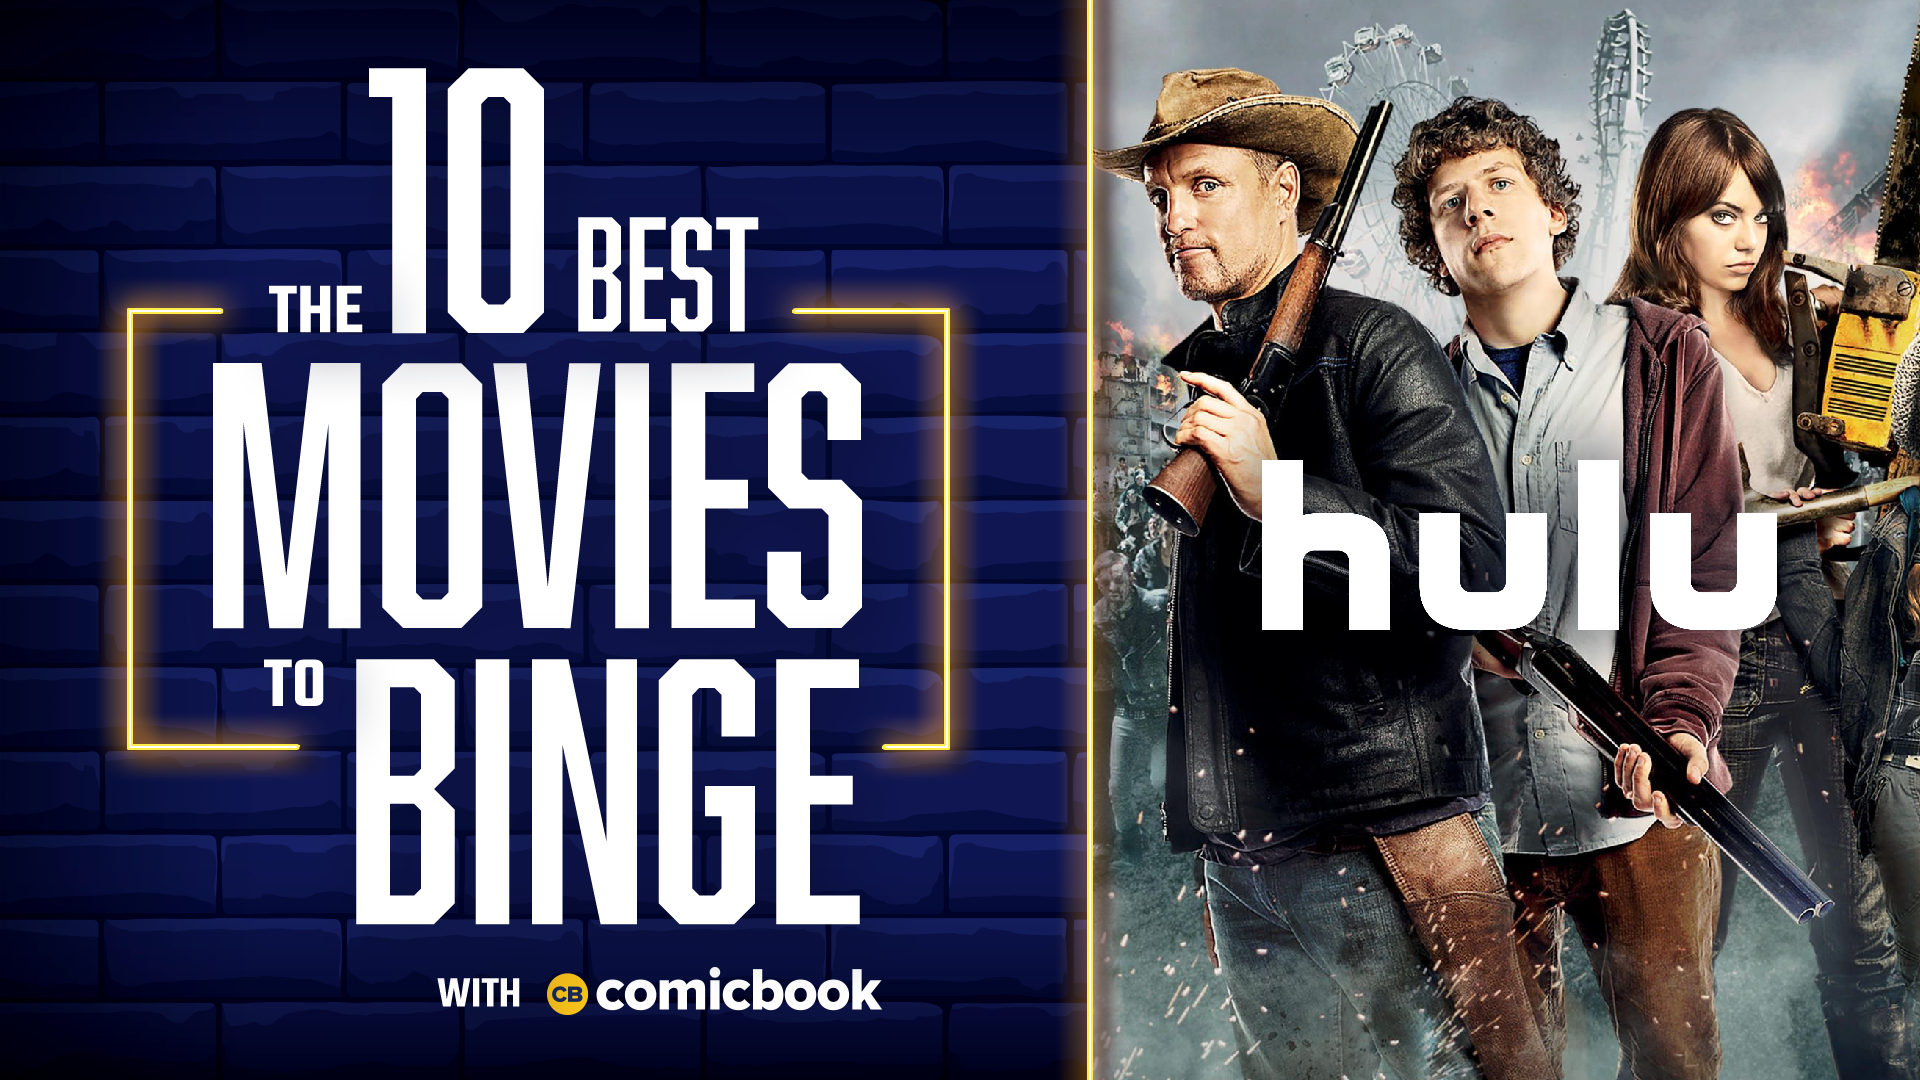 10 Best Movies to Binge on Hulu